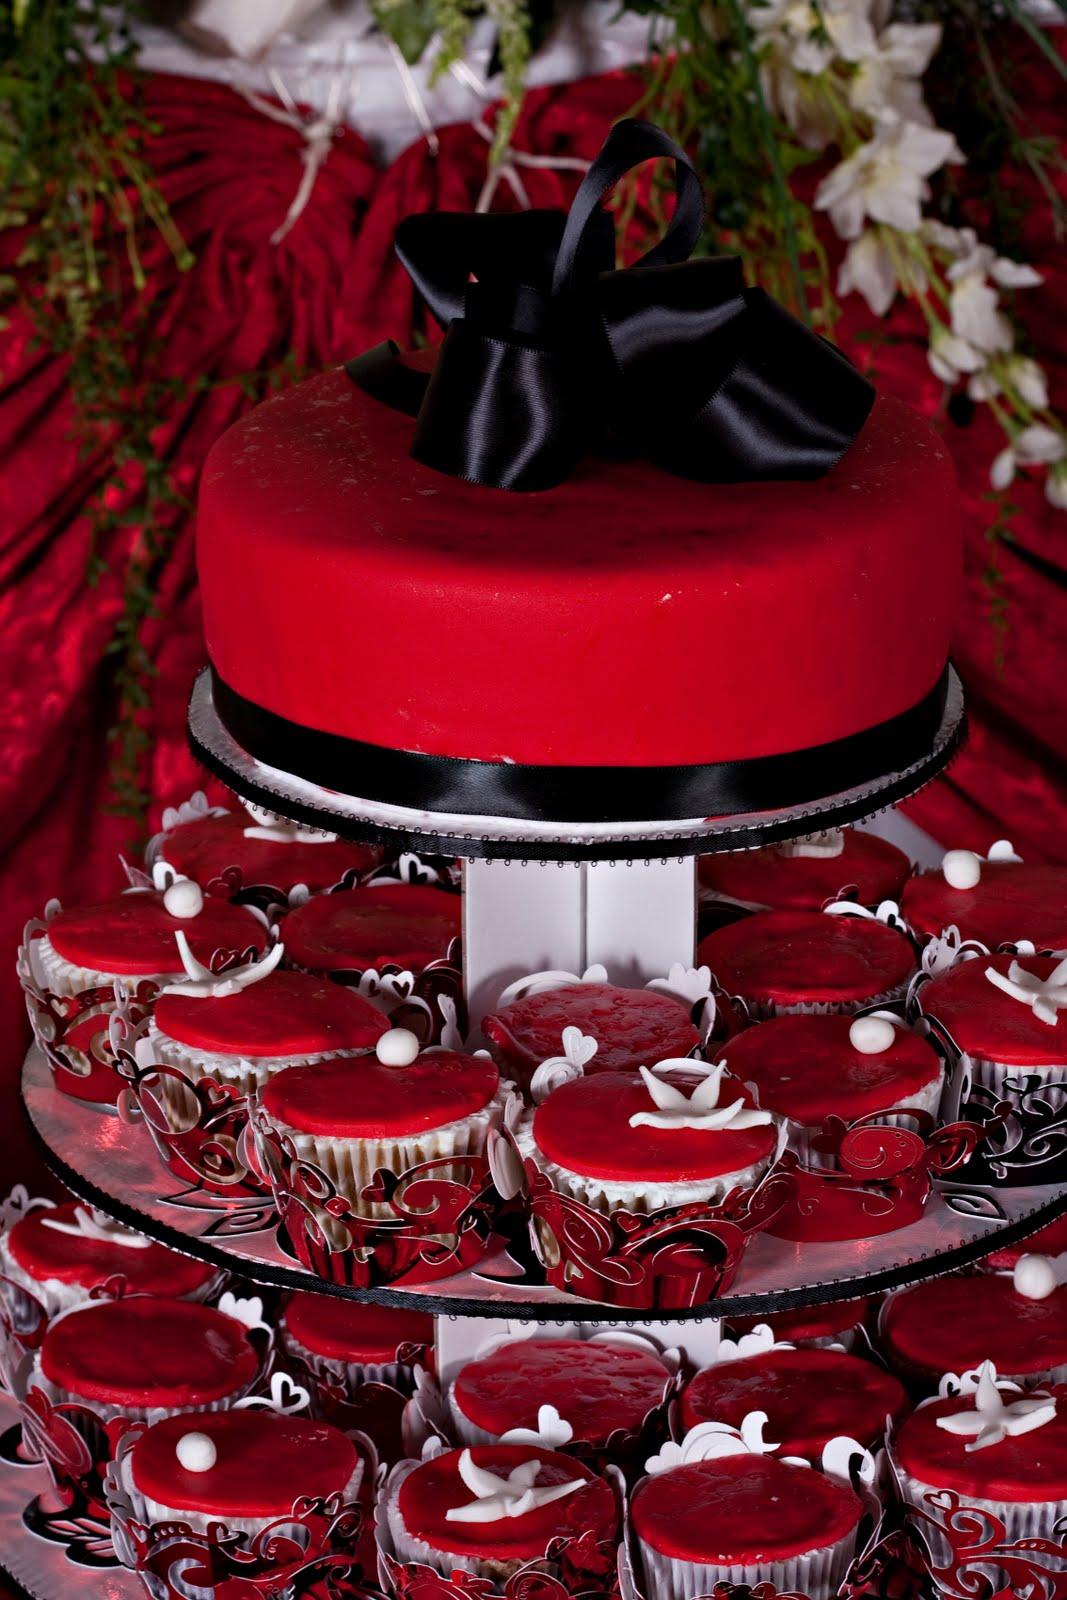 Design Of Debut Cake : Jocelyn s Wedding Cakes and More....: Leslie s Debut Cake